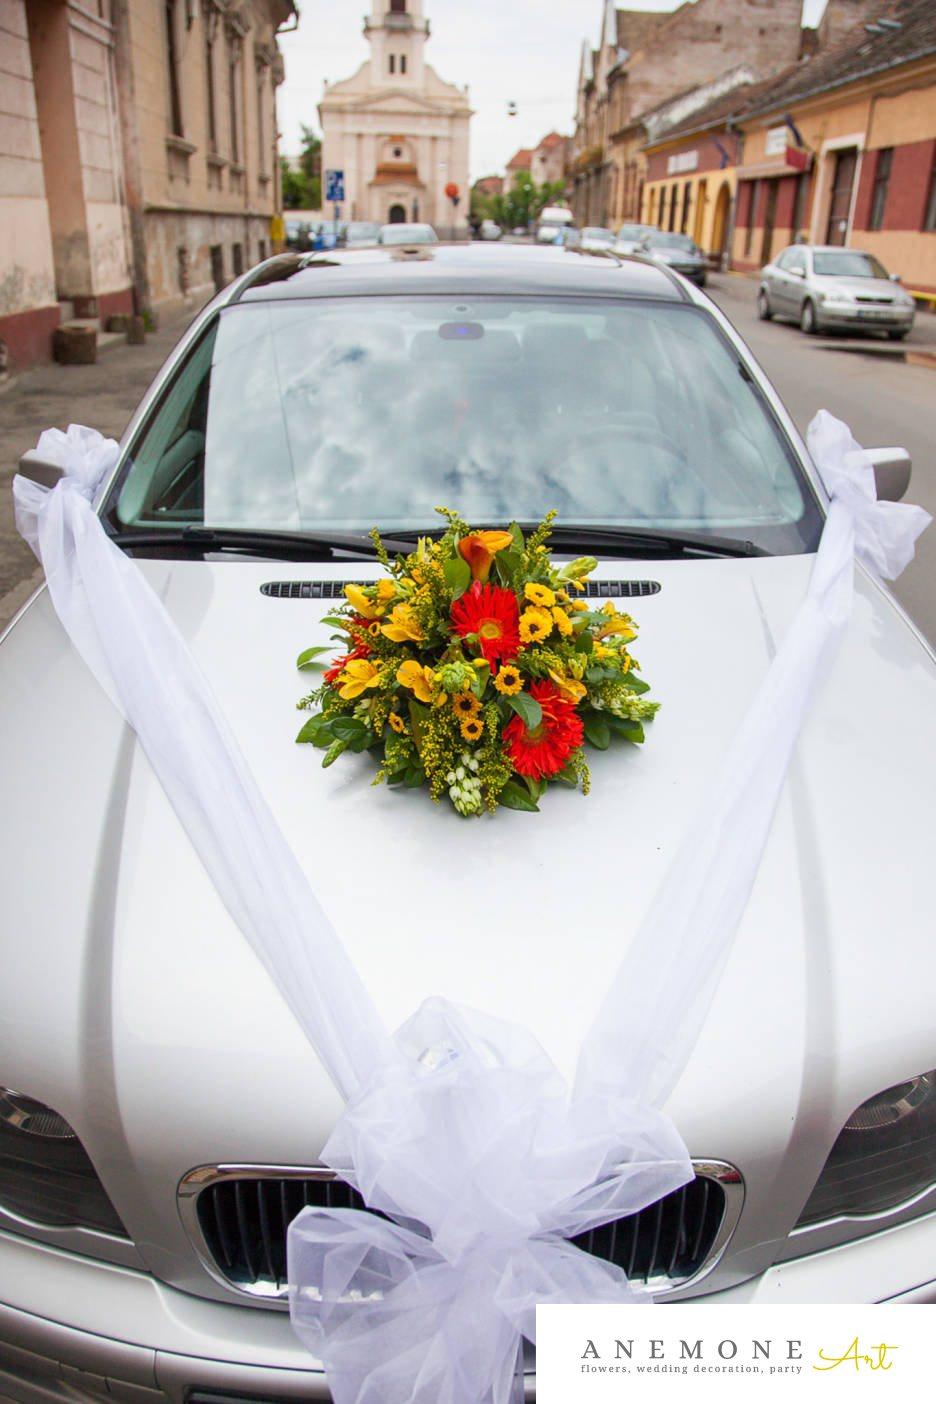 Poza, foto cu Flori de nunta alstroemeria, crizanteme, decor masina, frezii, galben, gerbera, rosu in Arad, Timisoara, Oradea (wedding flowers, bouquets) nunta Arad, Timisoara, Oradea